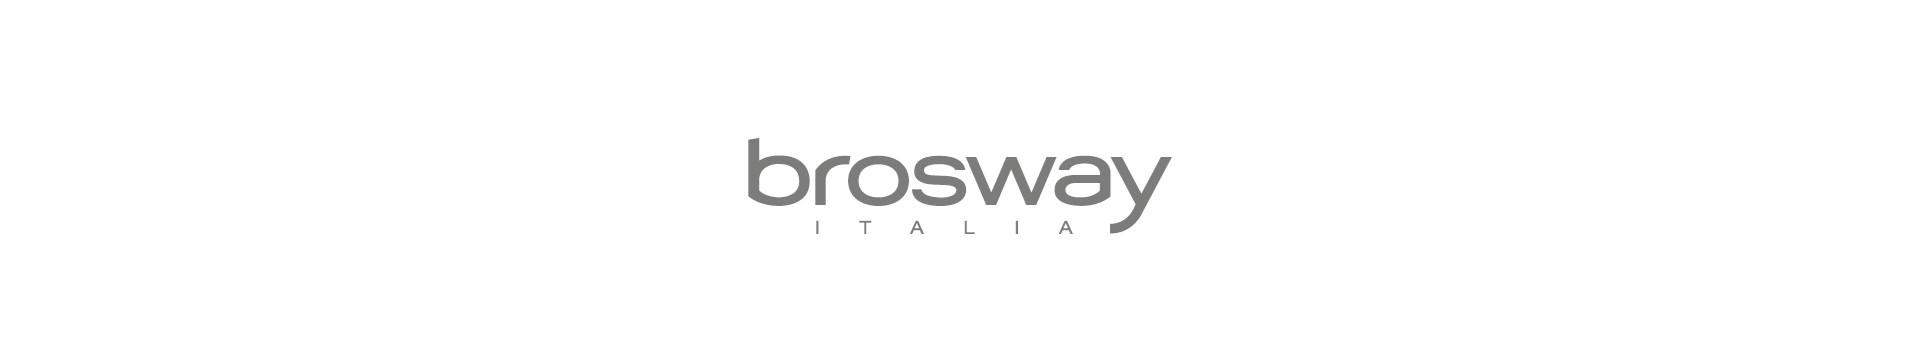 Brosway šperky